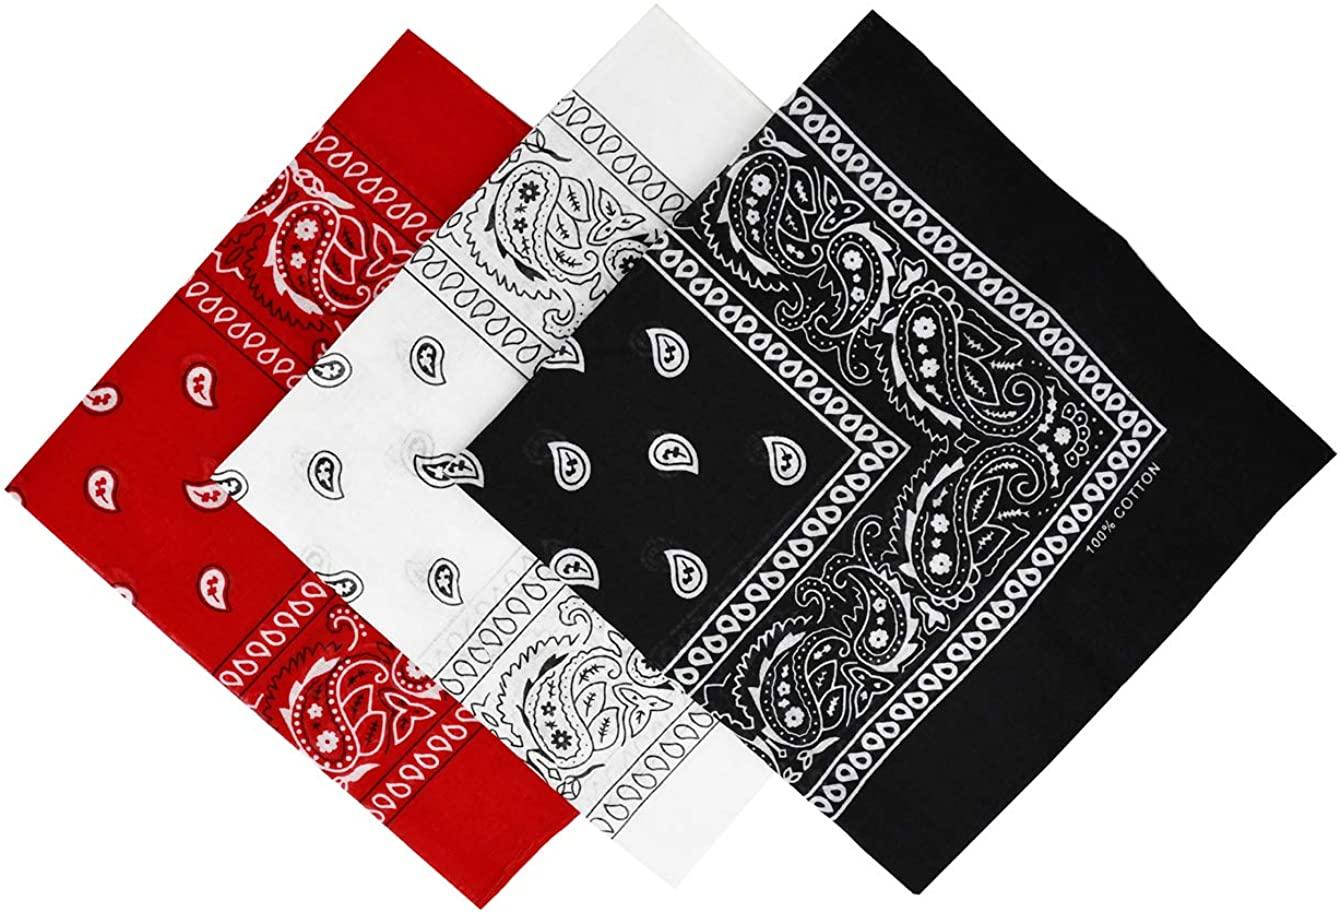 HCHYFZ 3PCS Paisley Bandanas for Men and Women Scarf Large 22x22inch